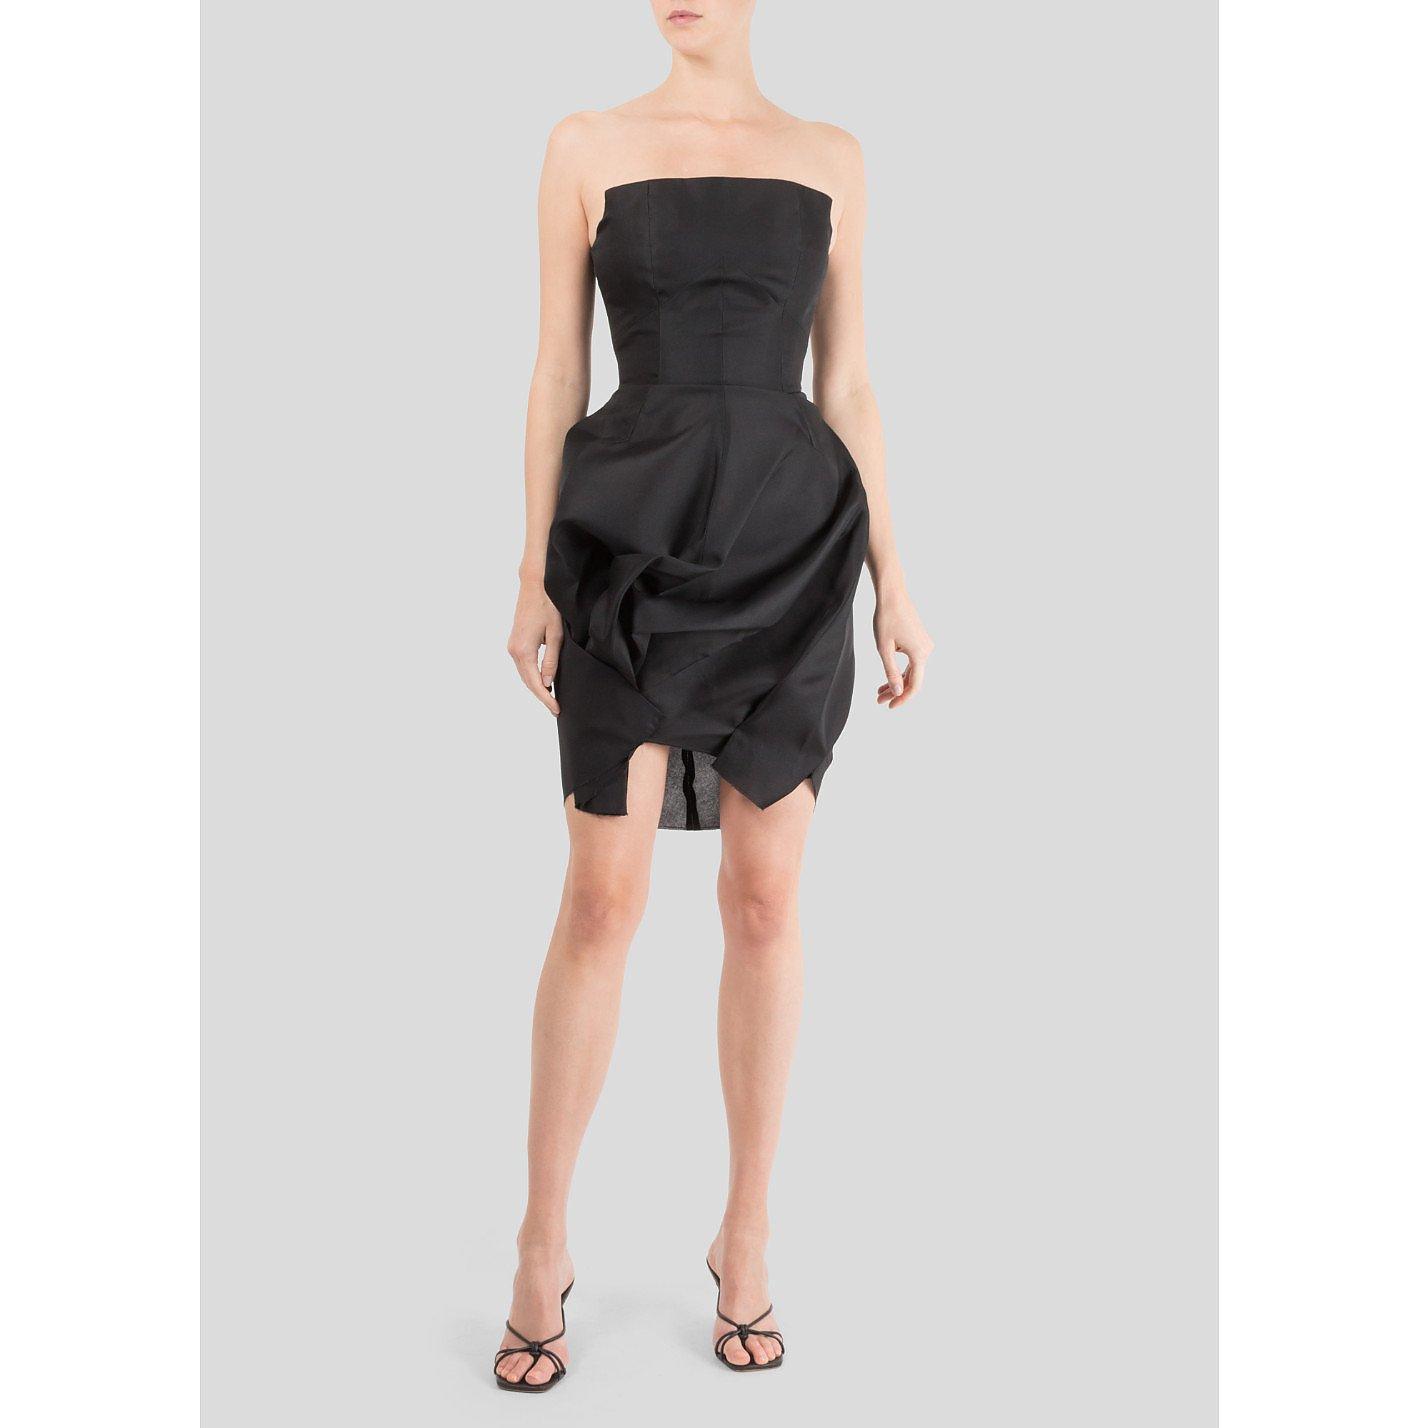 Victoria Beckham Twist Drape Corset Cocktail Dress